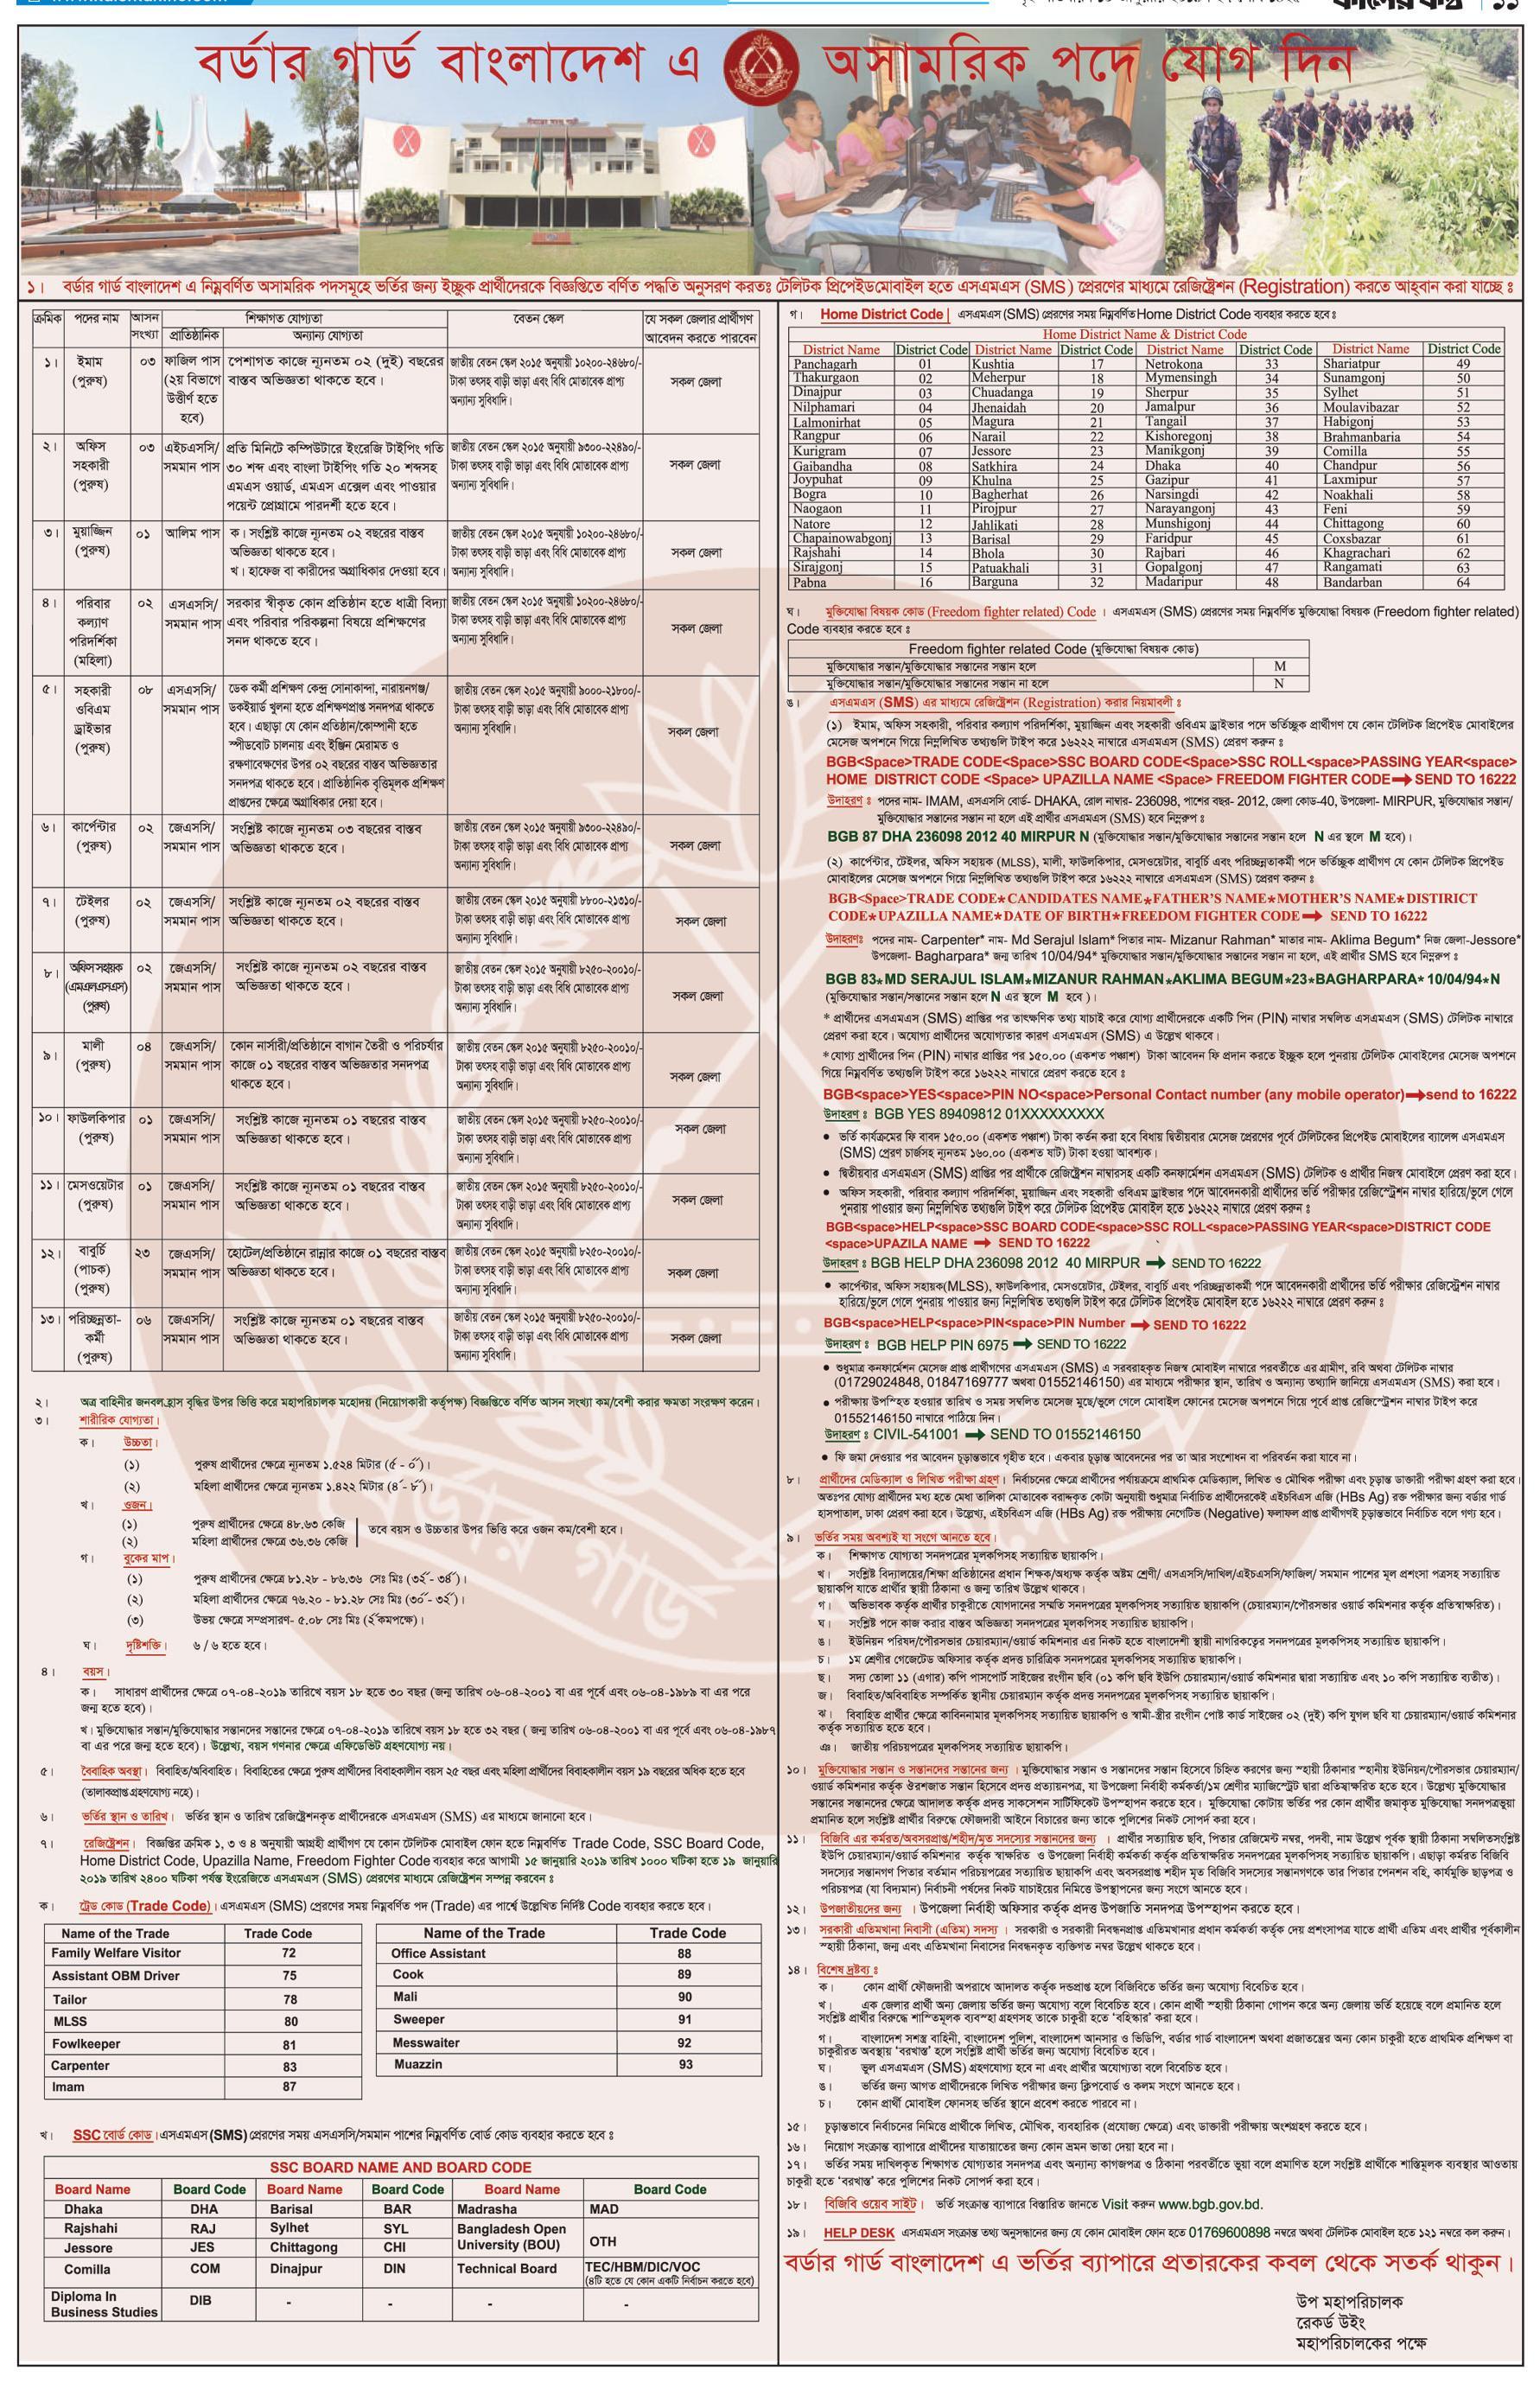 BGB Job Circular 2019 Recruitment Notice in Border Guard